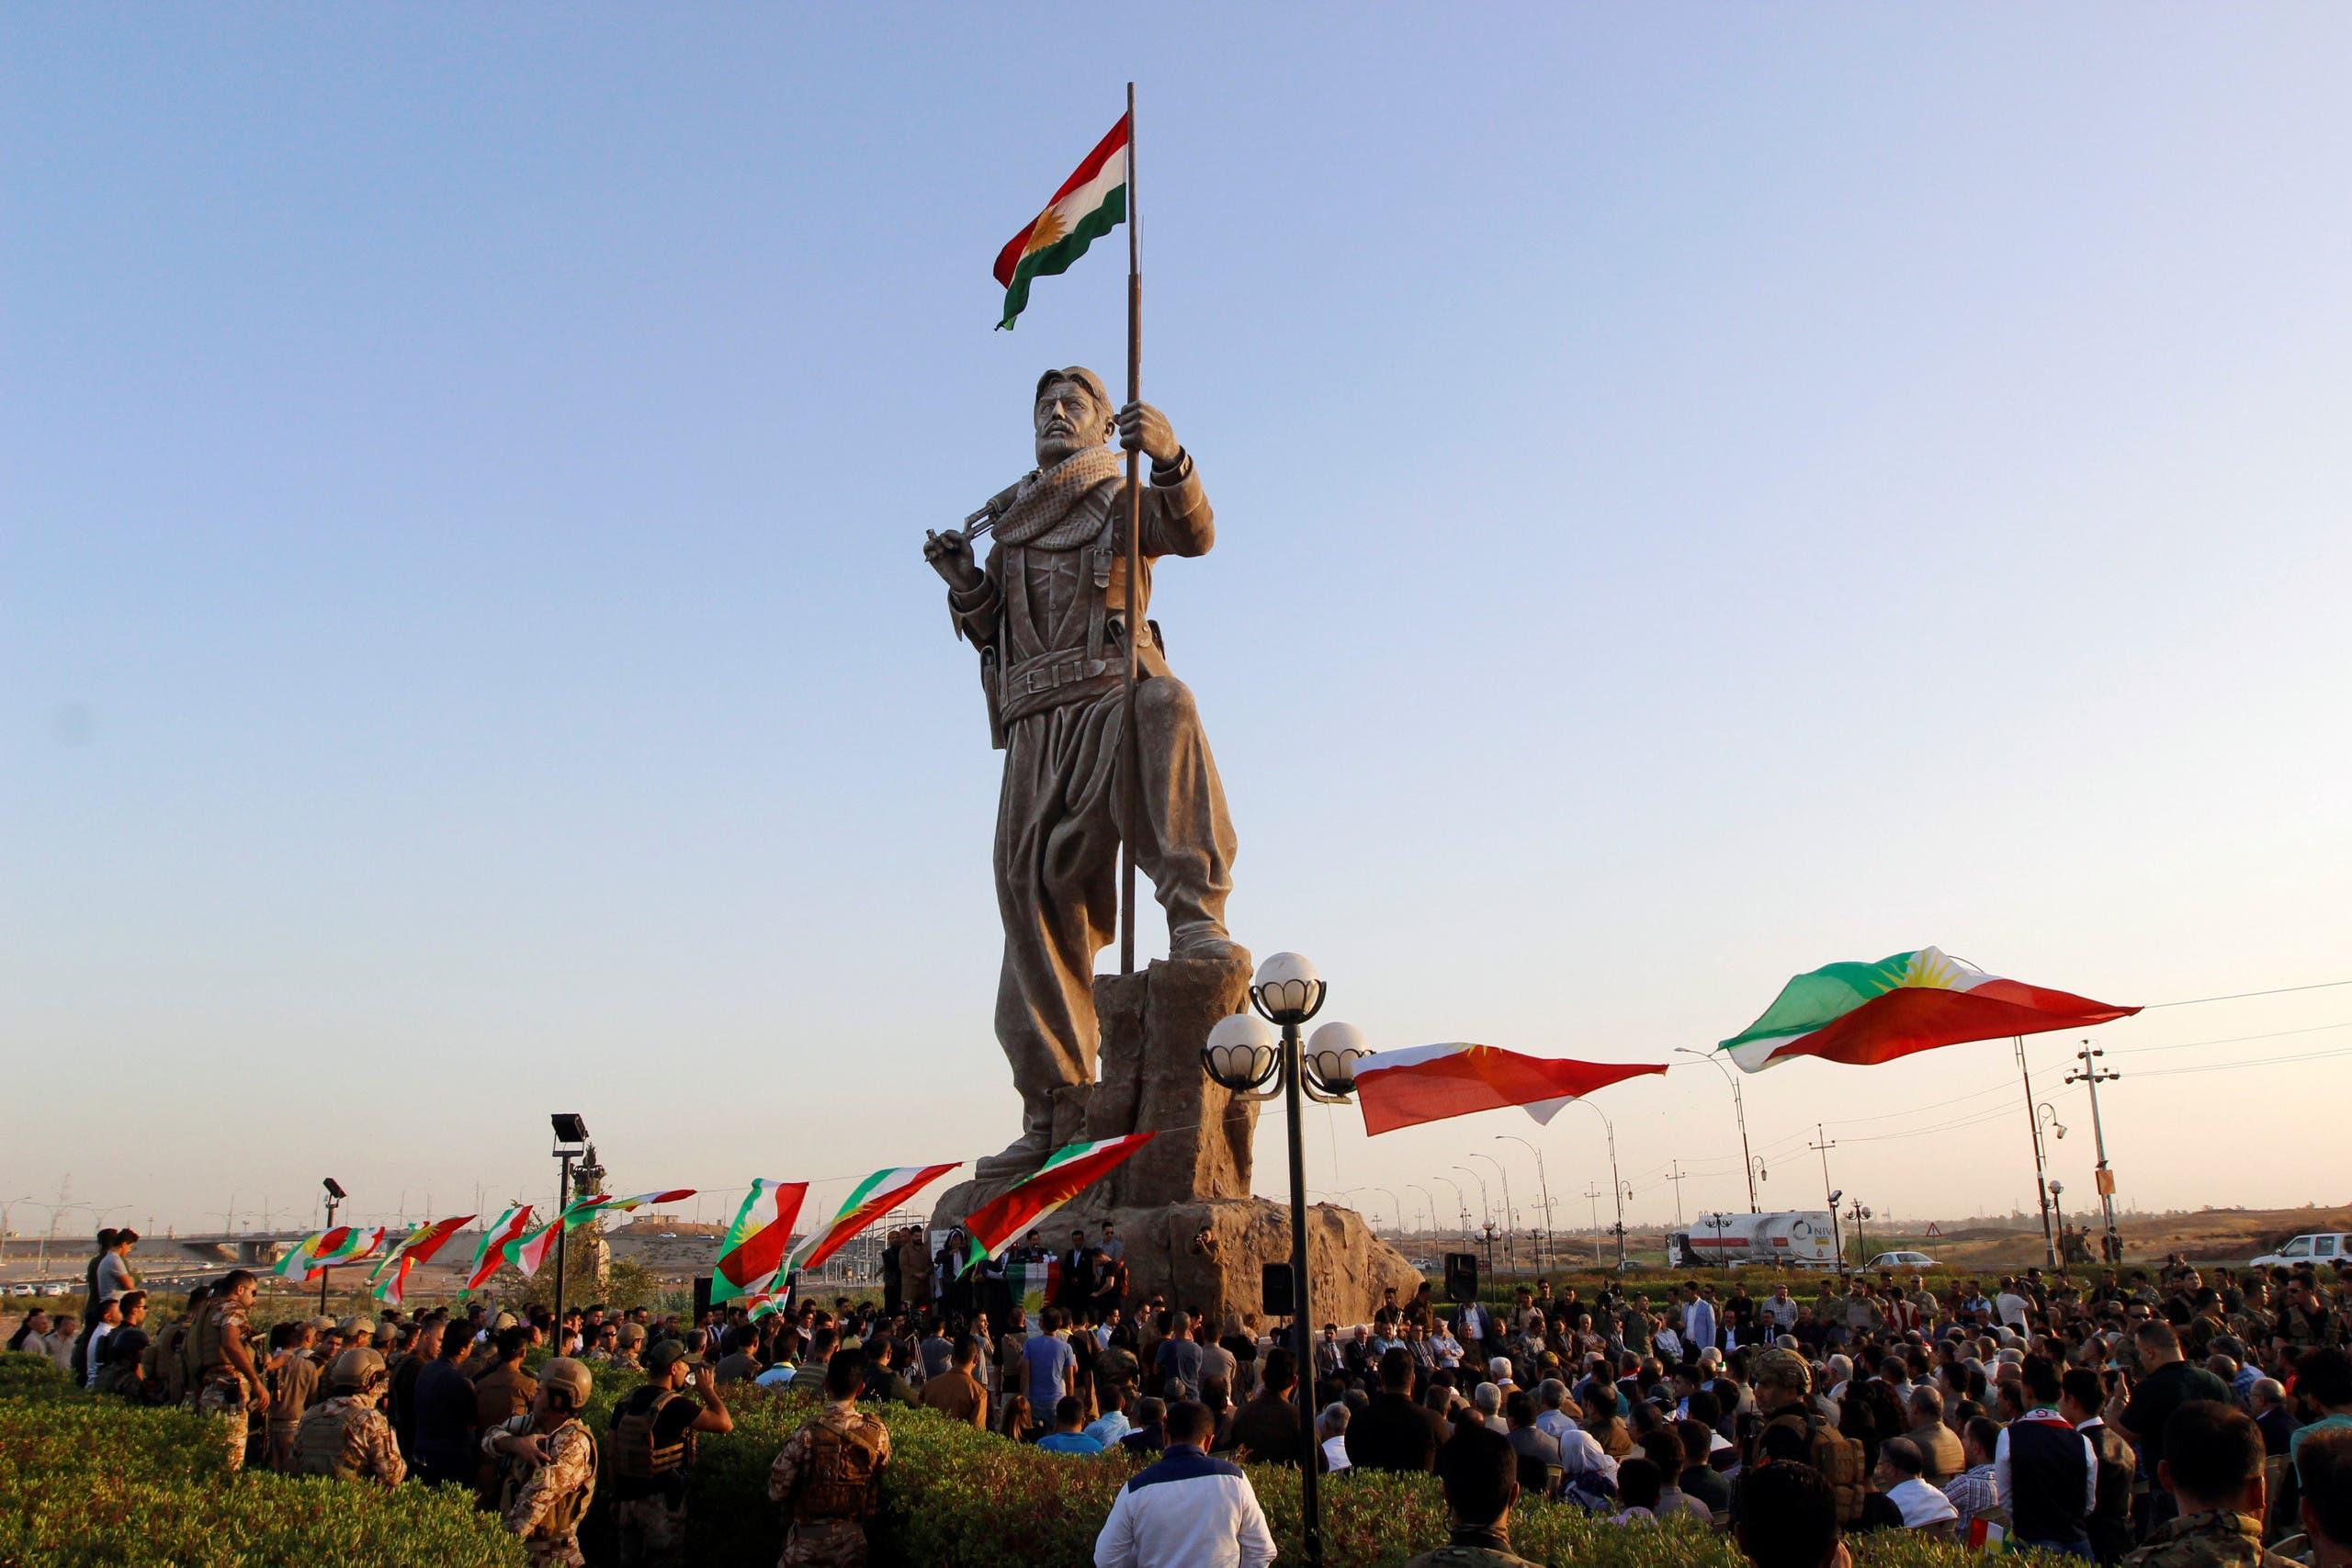 Newly unveiled statue in Kirkuk pays tribute to the Peshmerga, Iraqi Kurdistan's main fighting forces in Kirkuk, Iraq September 23, 2017. REUTERS/Ako Rasheed